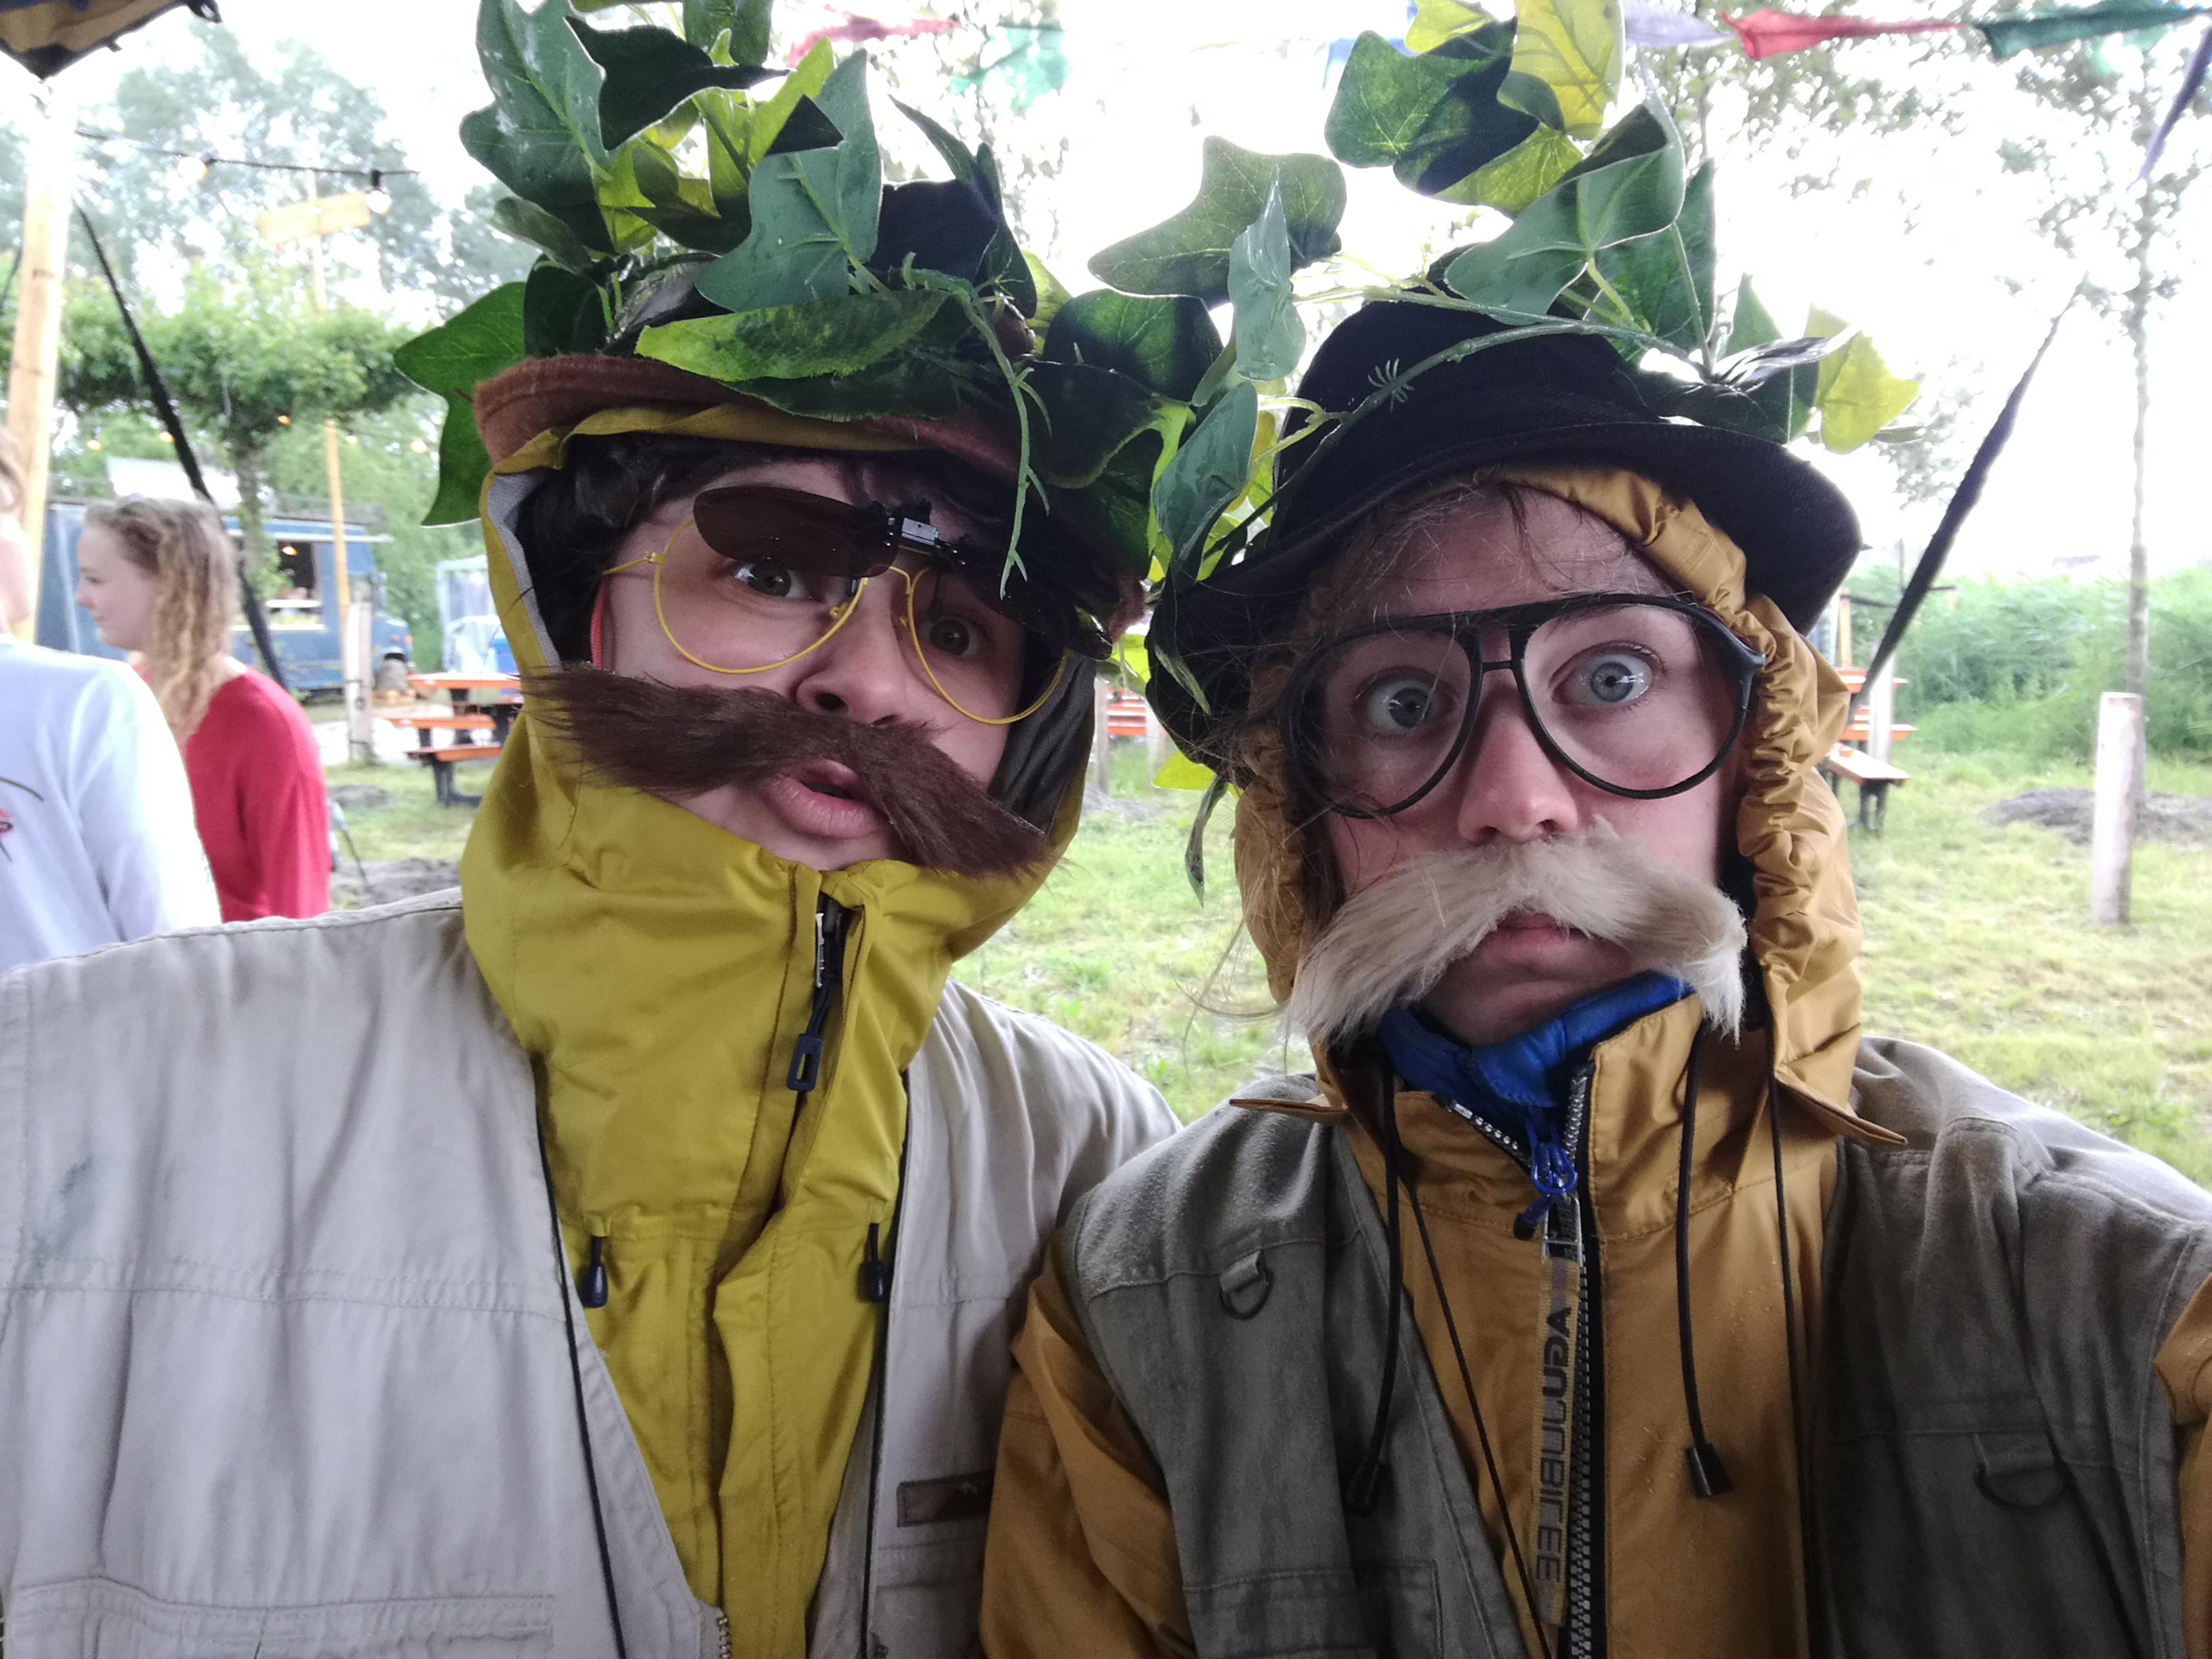 Voedselboswachters Bram en Kees New Grounds festival 2019